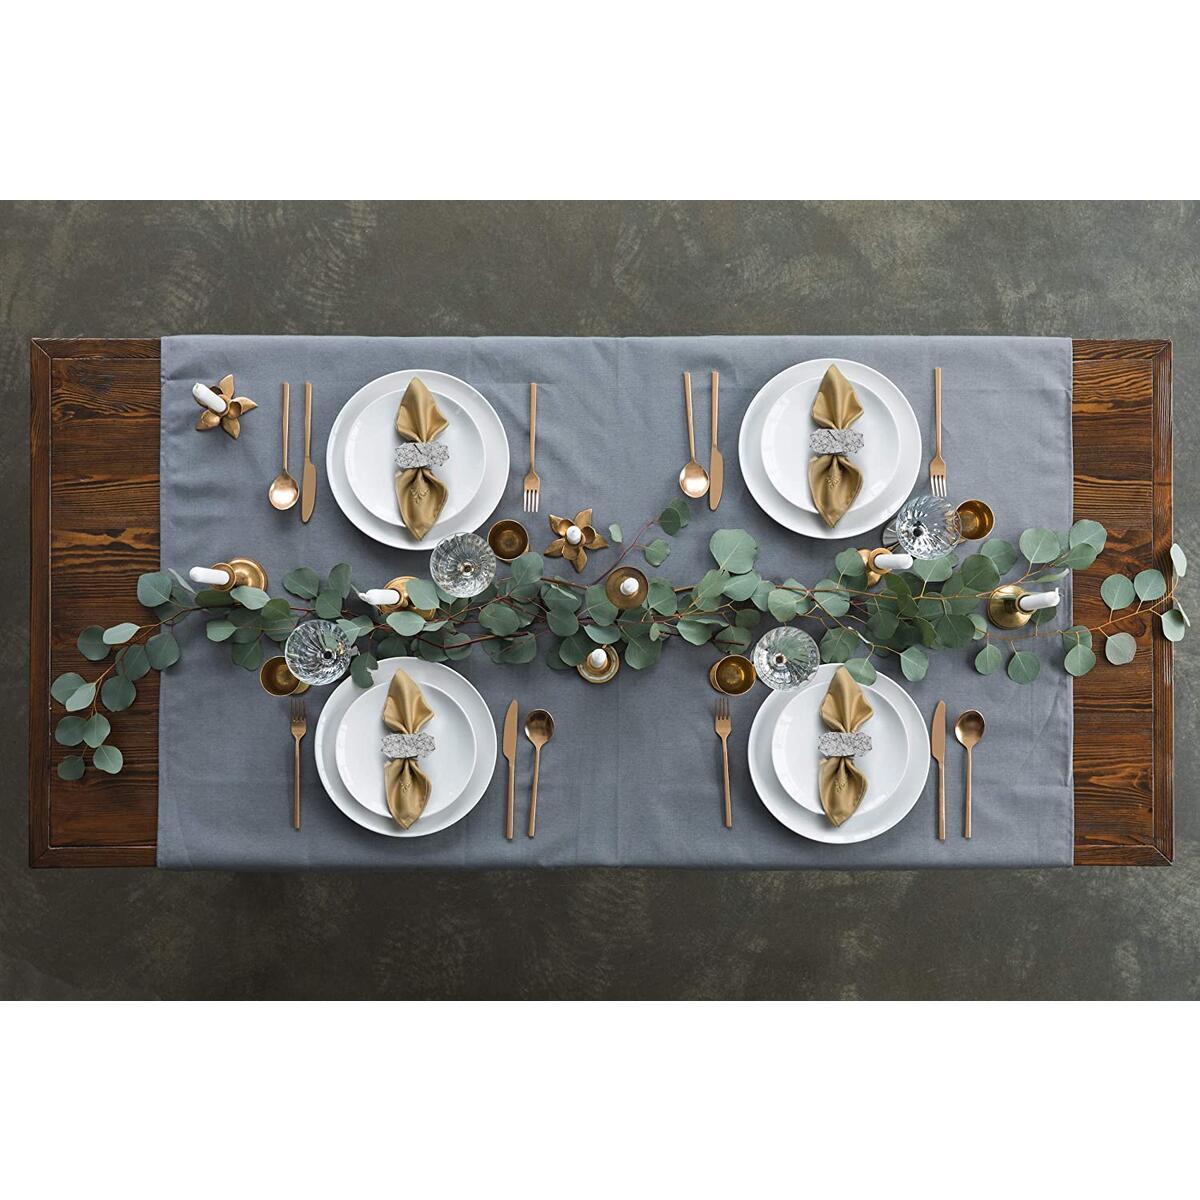 Napkin Ring Set for Wedding (Grey, Felt)